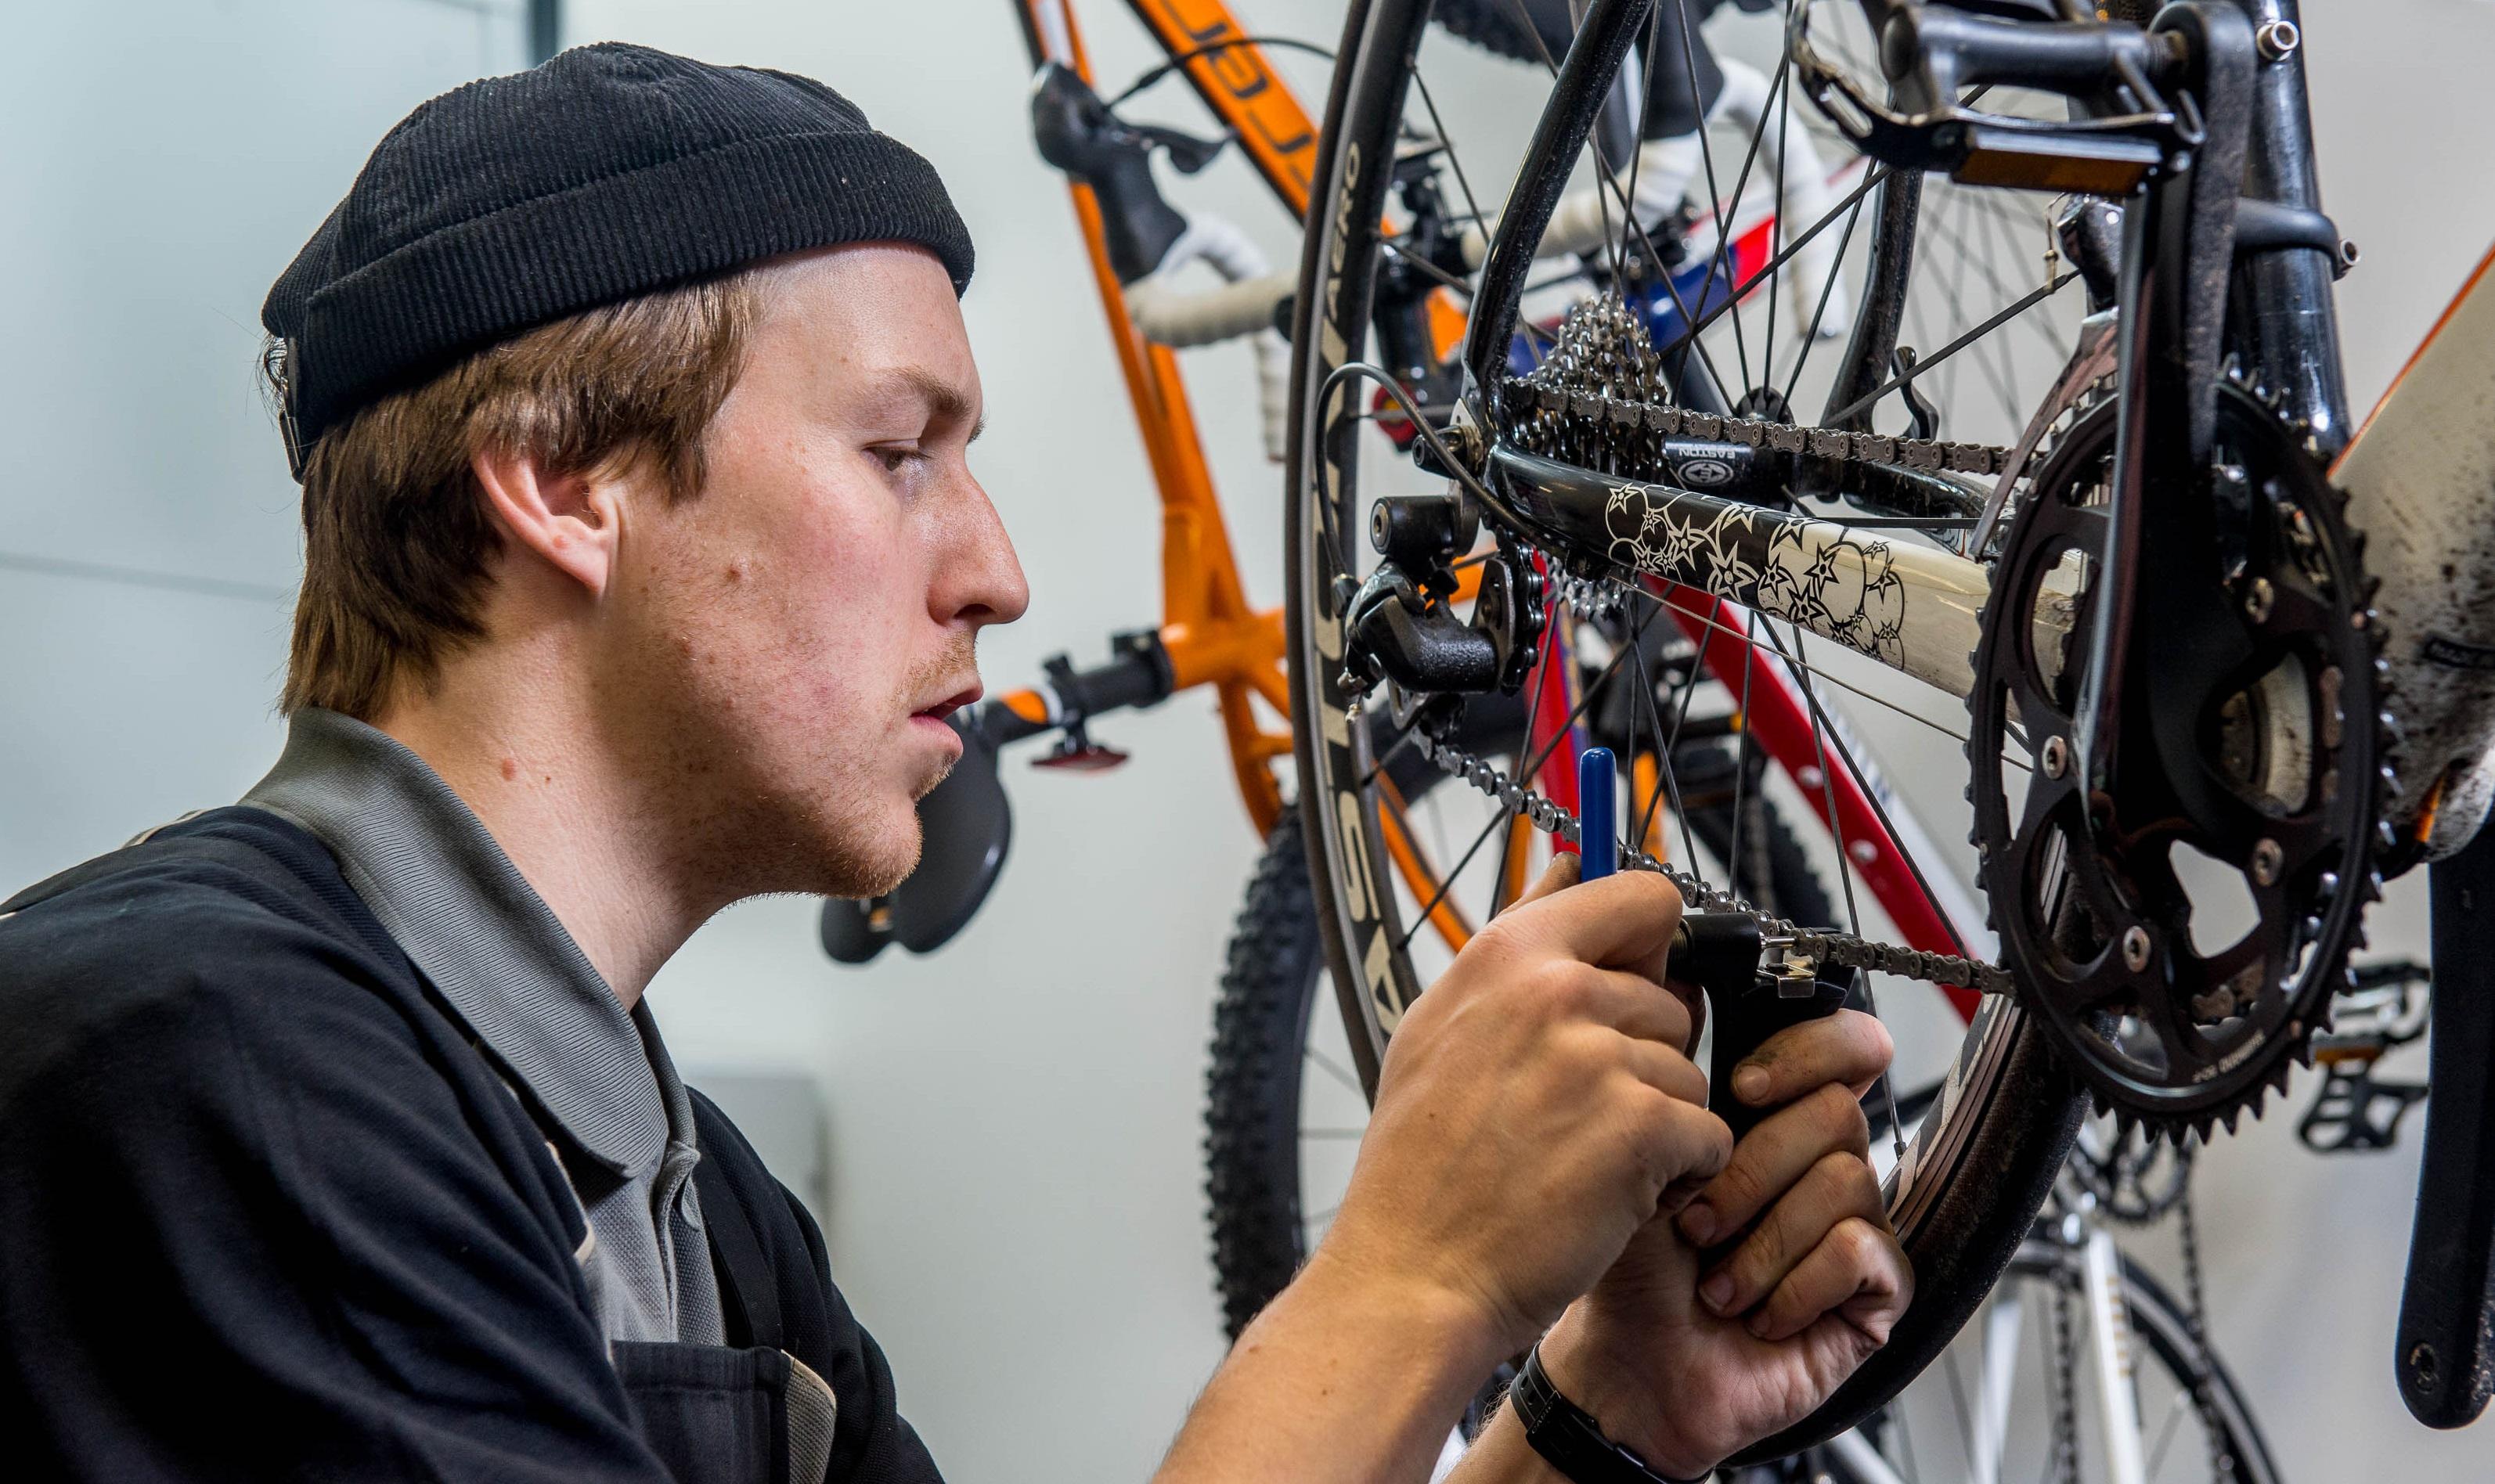 FREE BikeNite Workshop Available